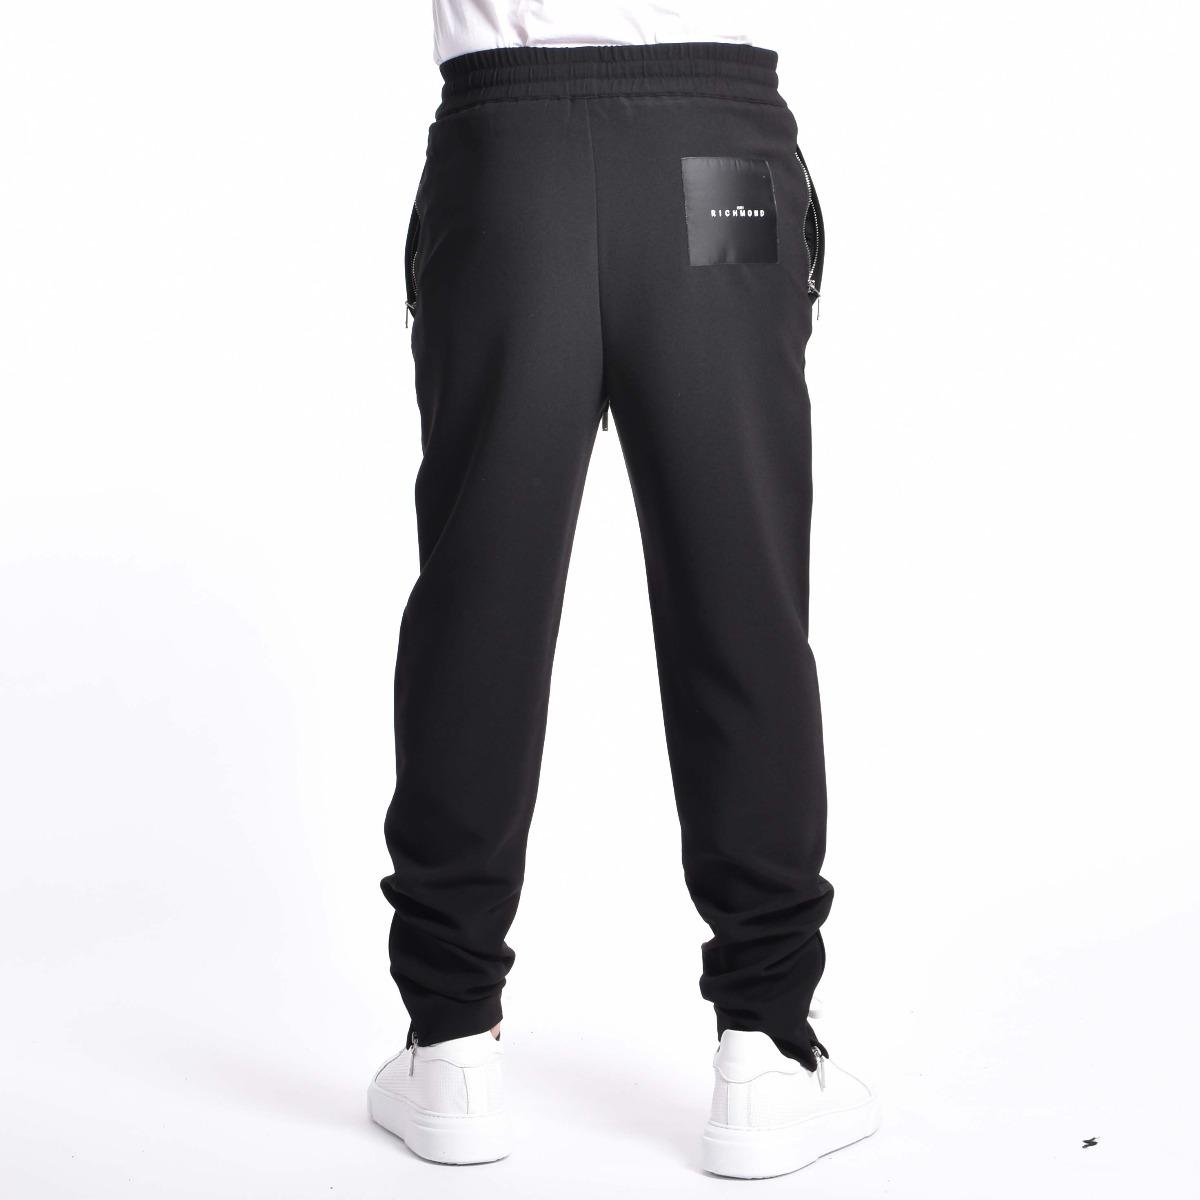 Pantalone tuta fleece pudmore- Nero